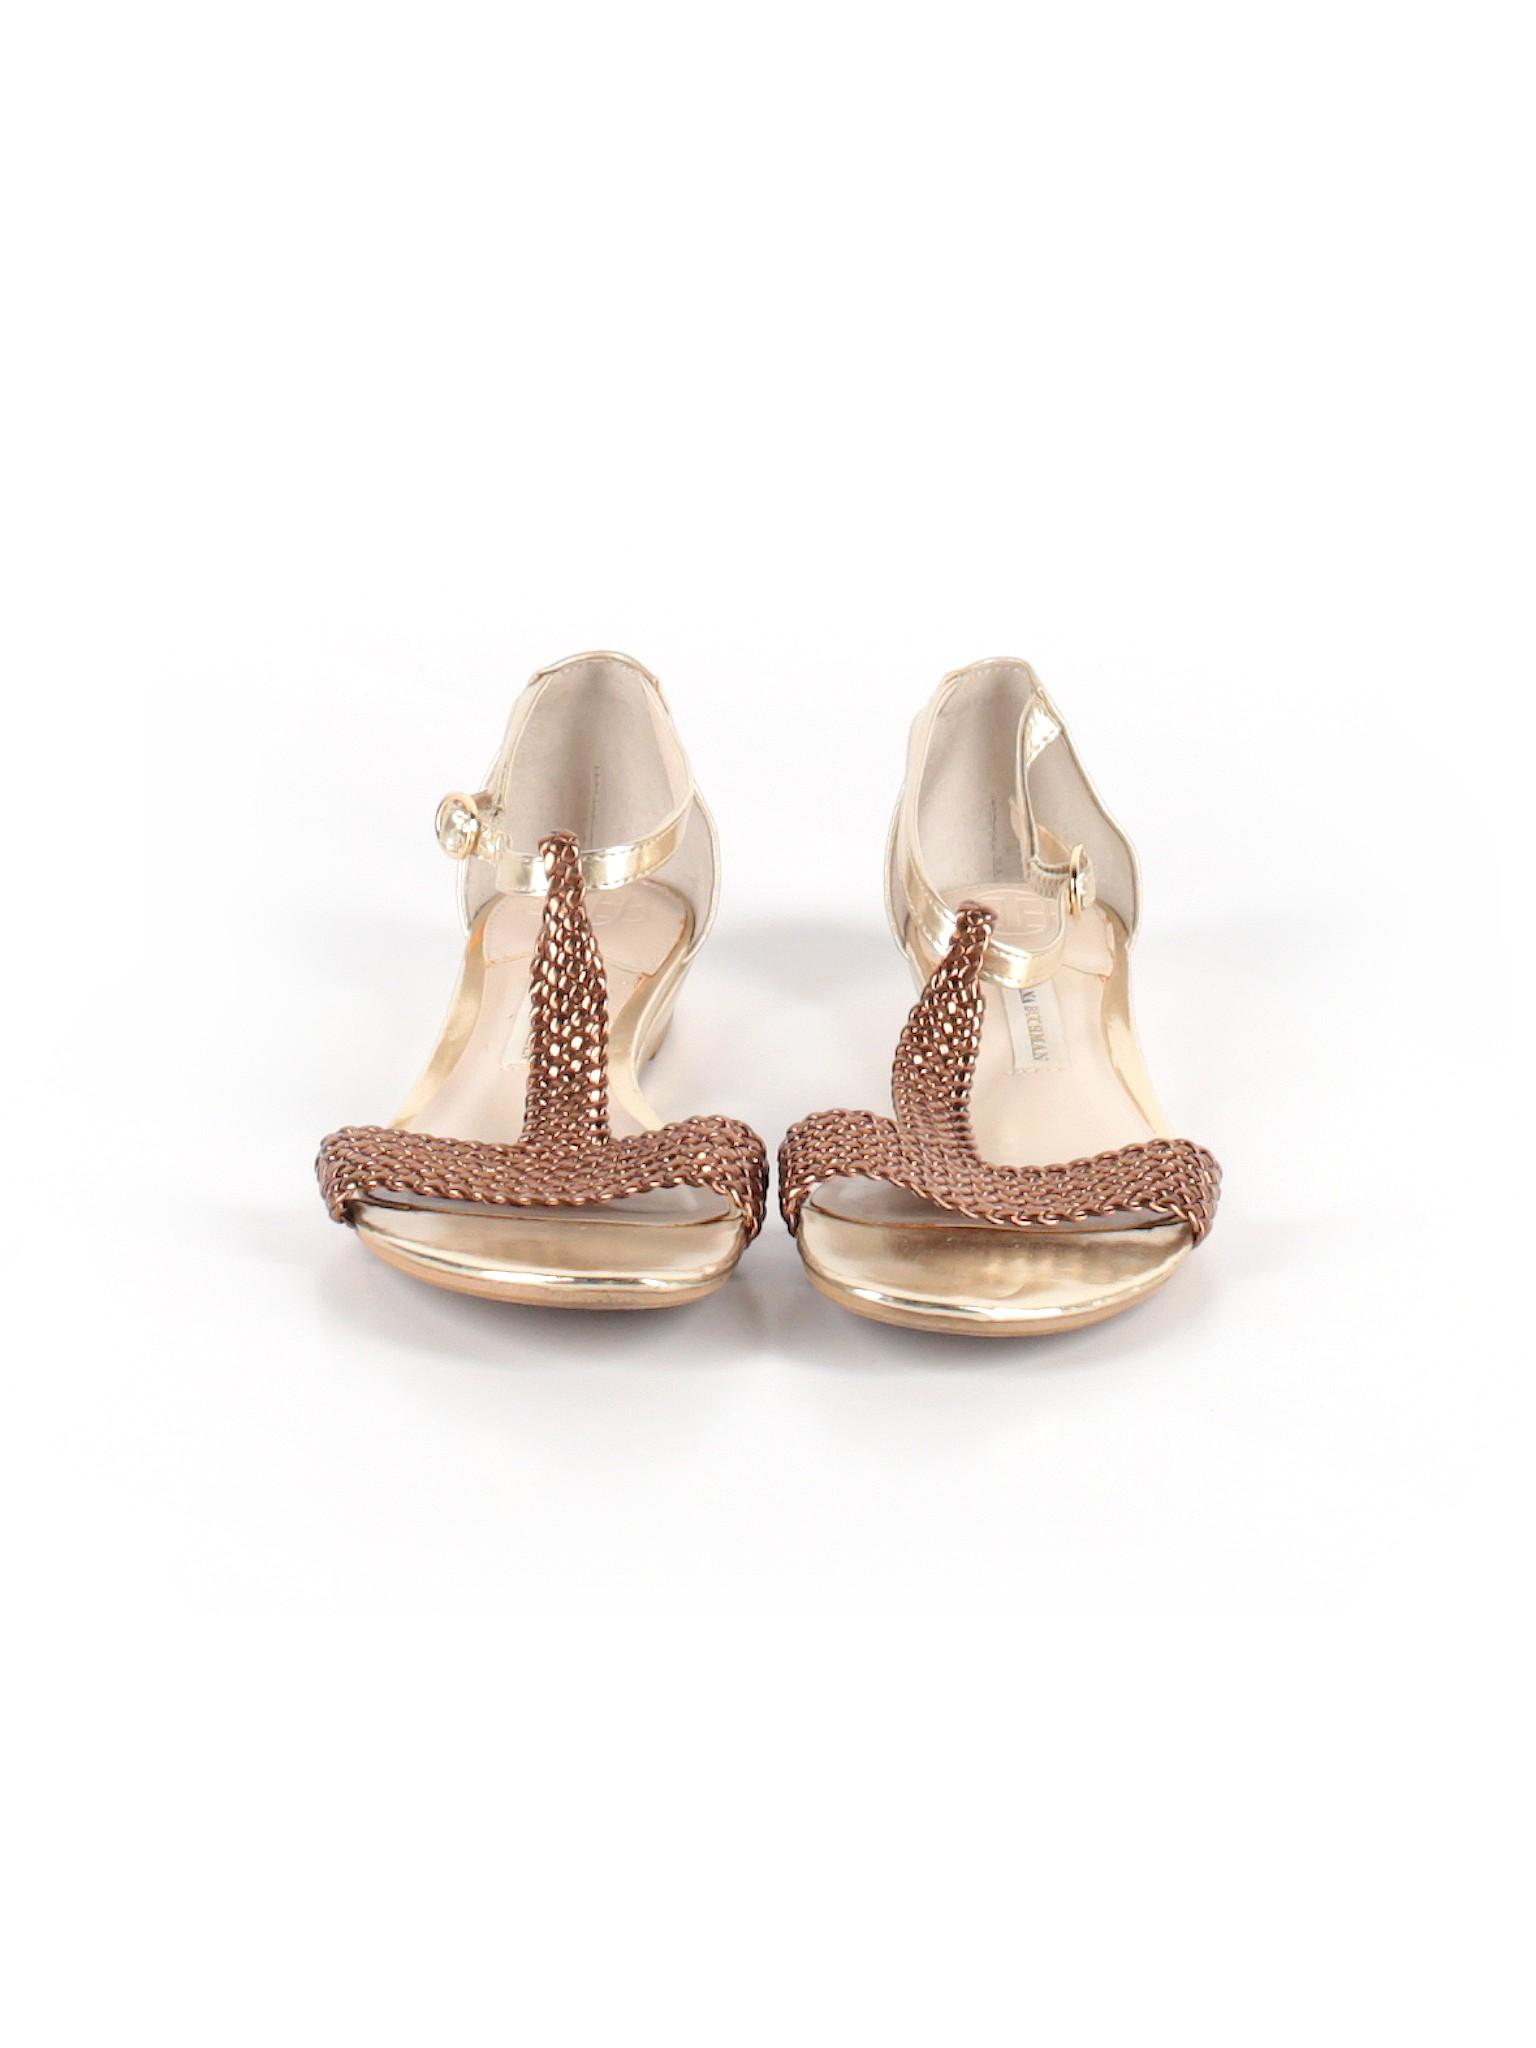 9638d8d35 Dana Buchman Solid Gold Sandals Size 7 1 2 - 70% off